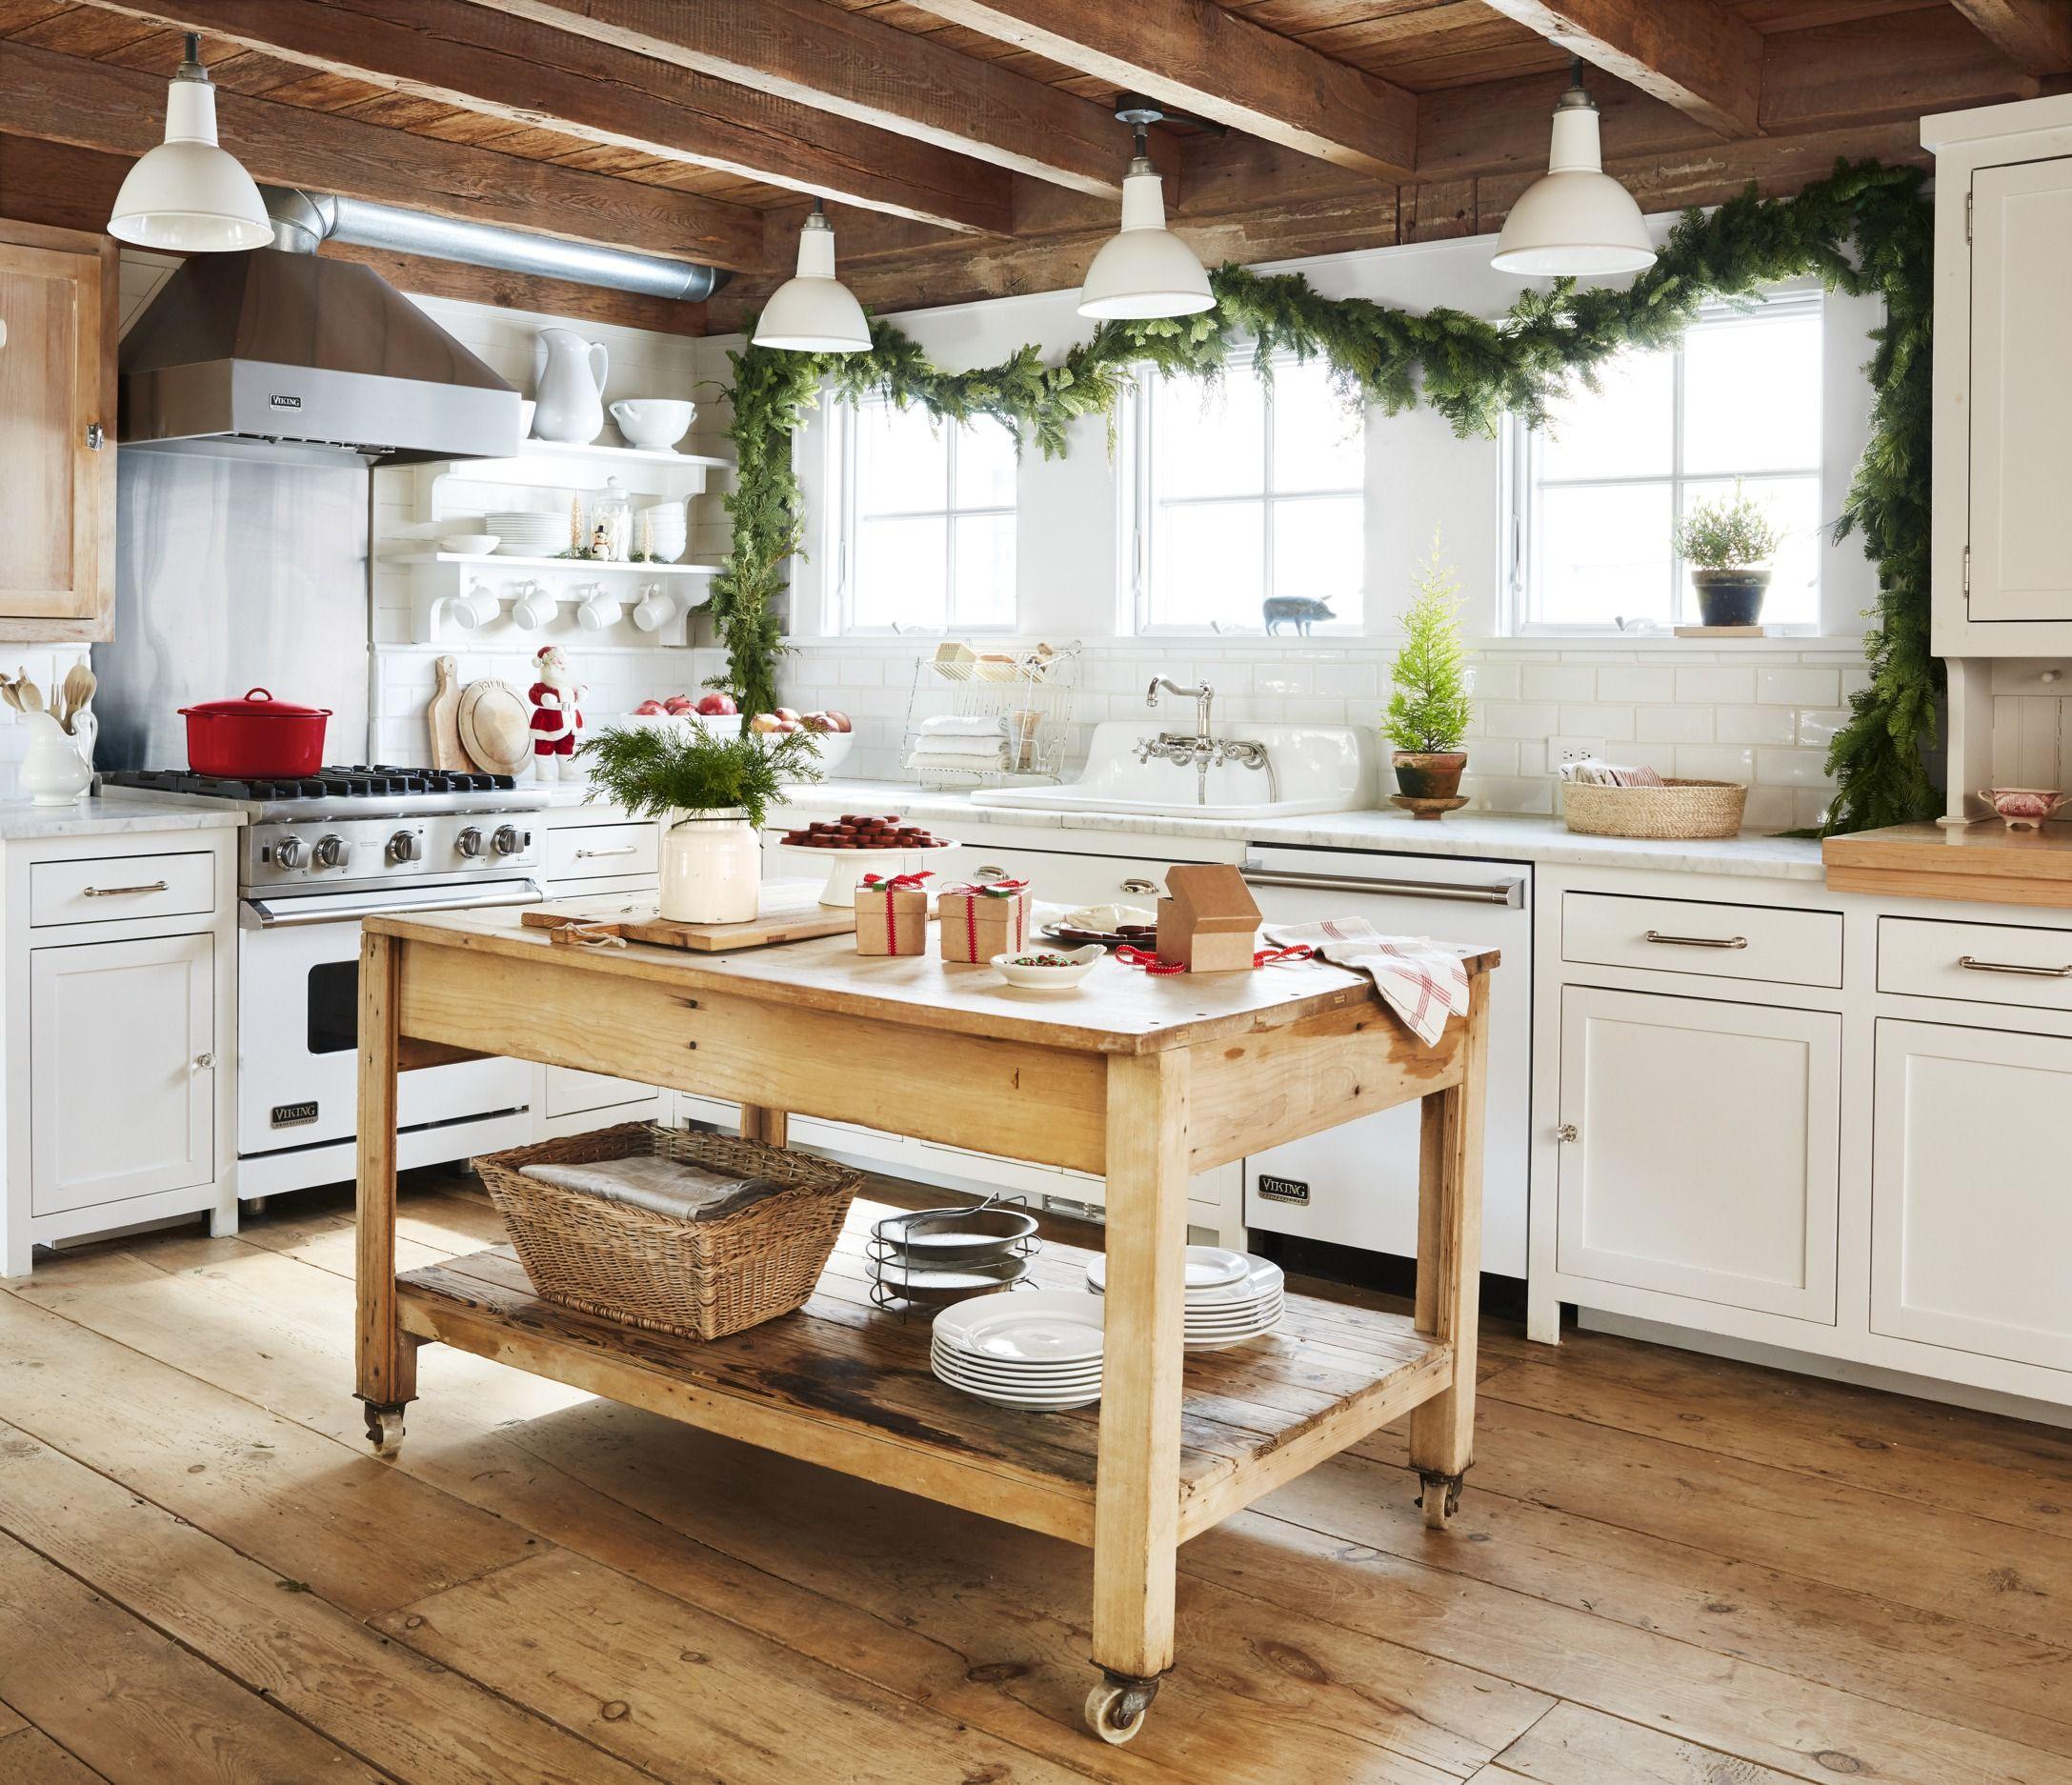 10 Best Christmas Window Decorating Ideas 10 - Holiday Window